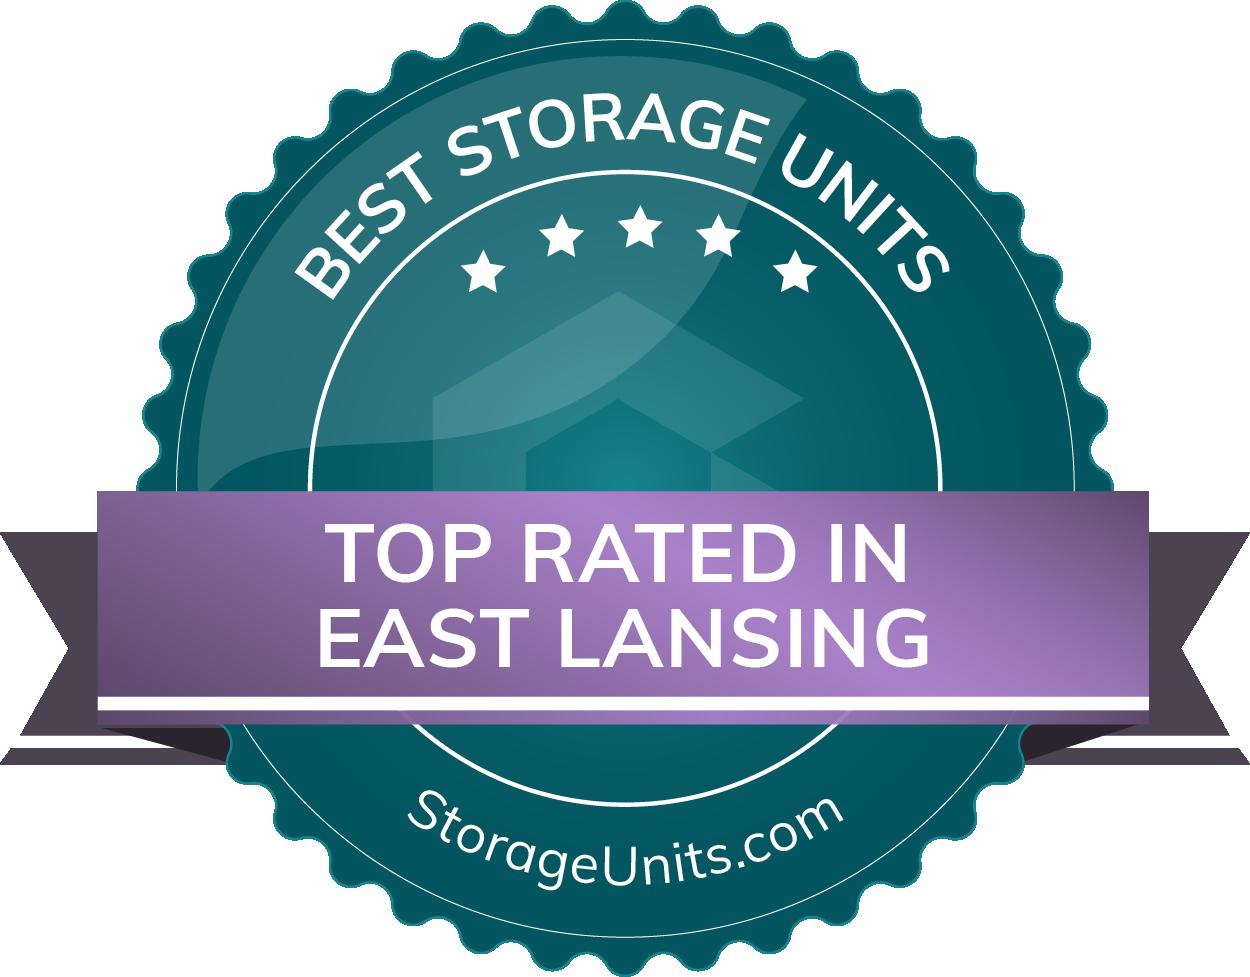 Best Self Storage Units in East Lansing, MI